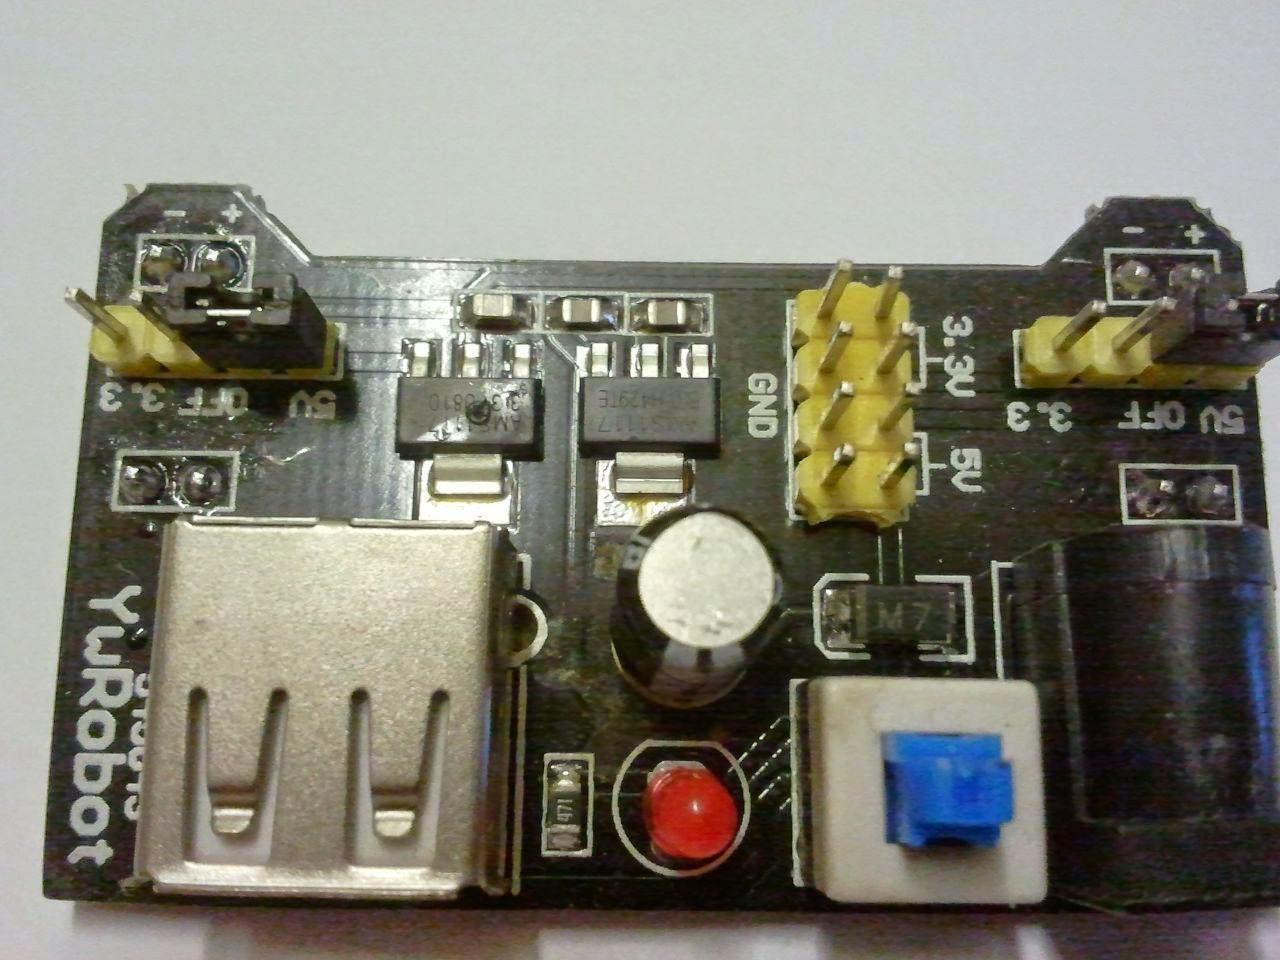 IK1ZYW Labs: Breadboard power supply module destructive failure